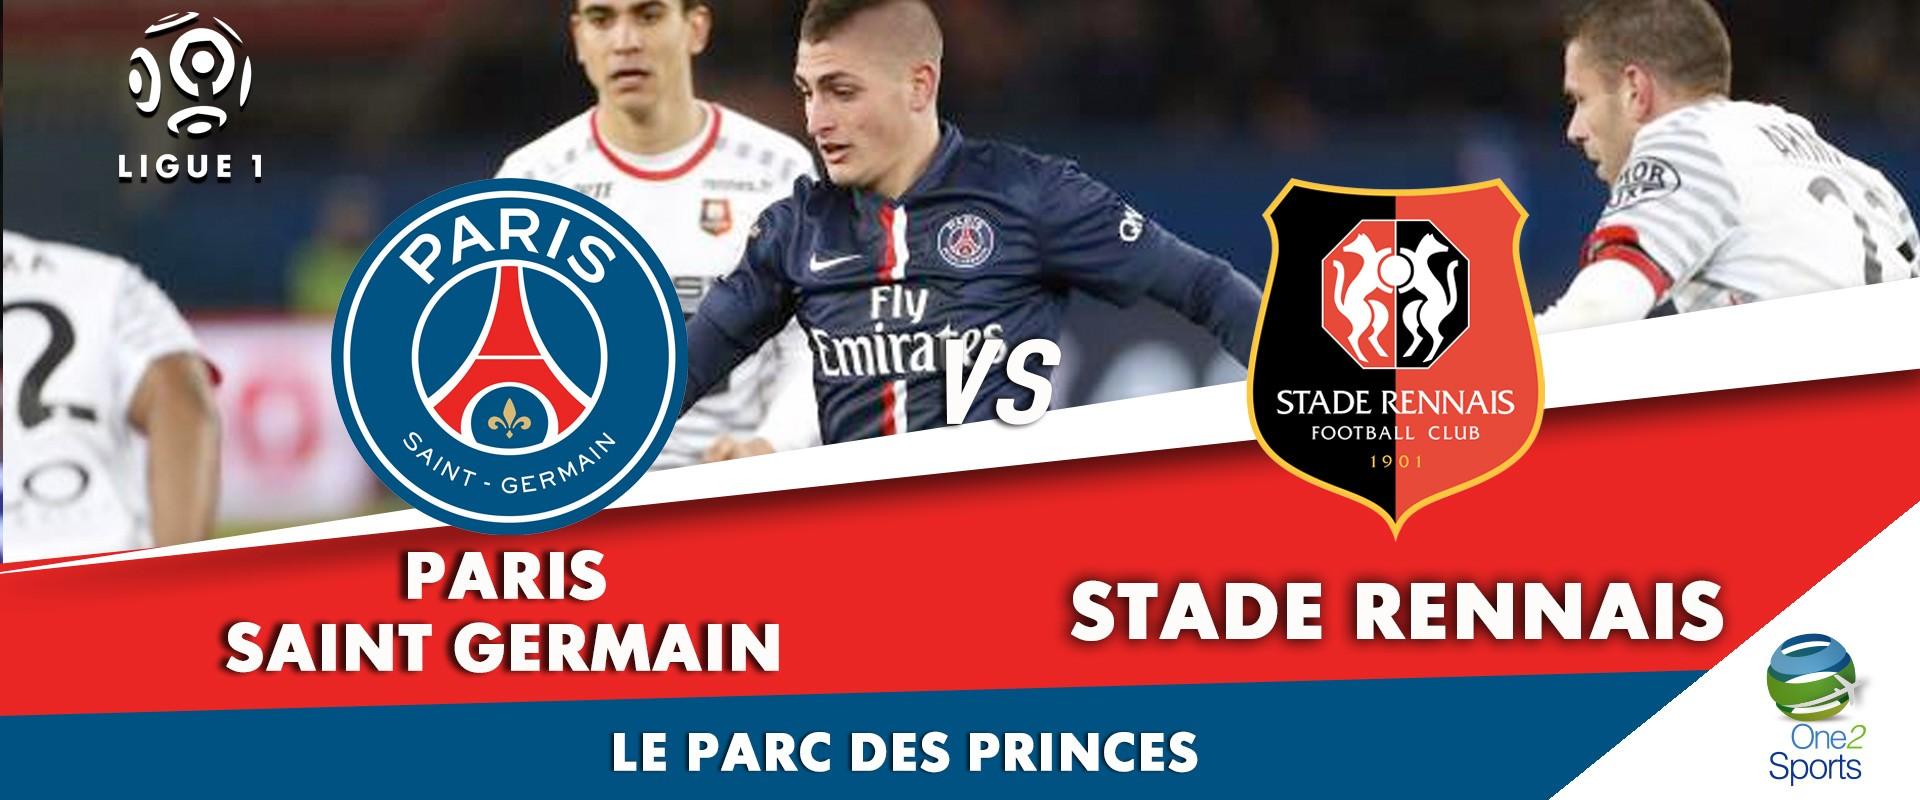 Paris Saint German vs Stade Rennais